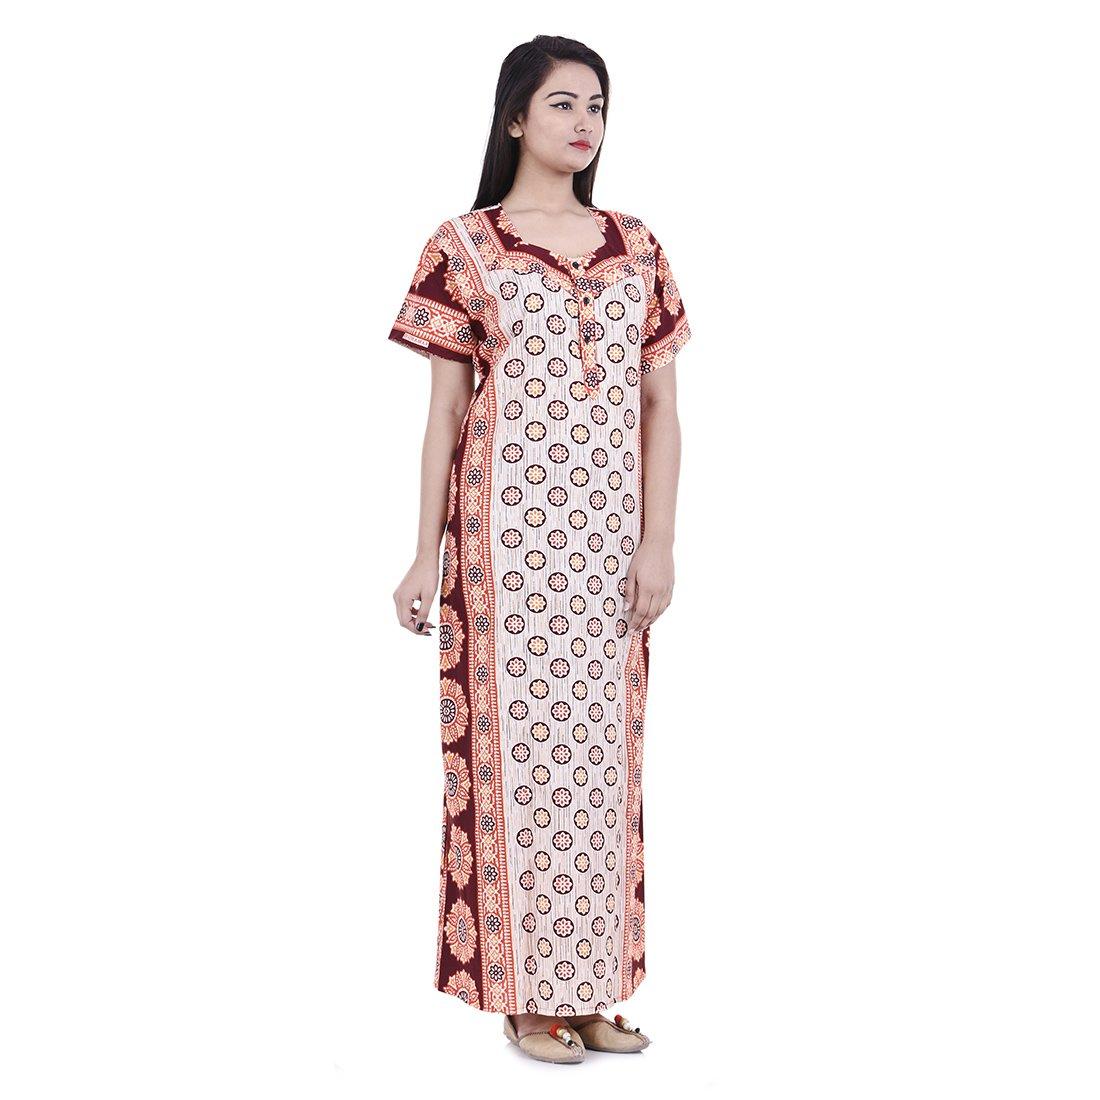 955fa604d2 Womens nighty nightwear gown cotton maxi dress sleepwear nightgown bikini  cover beachwear at amazon women clothing